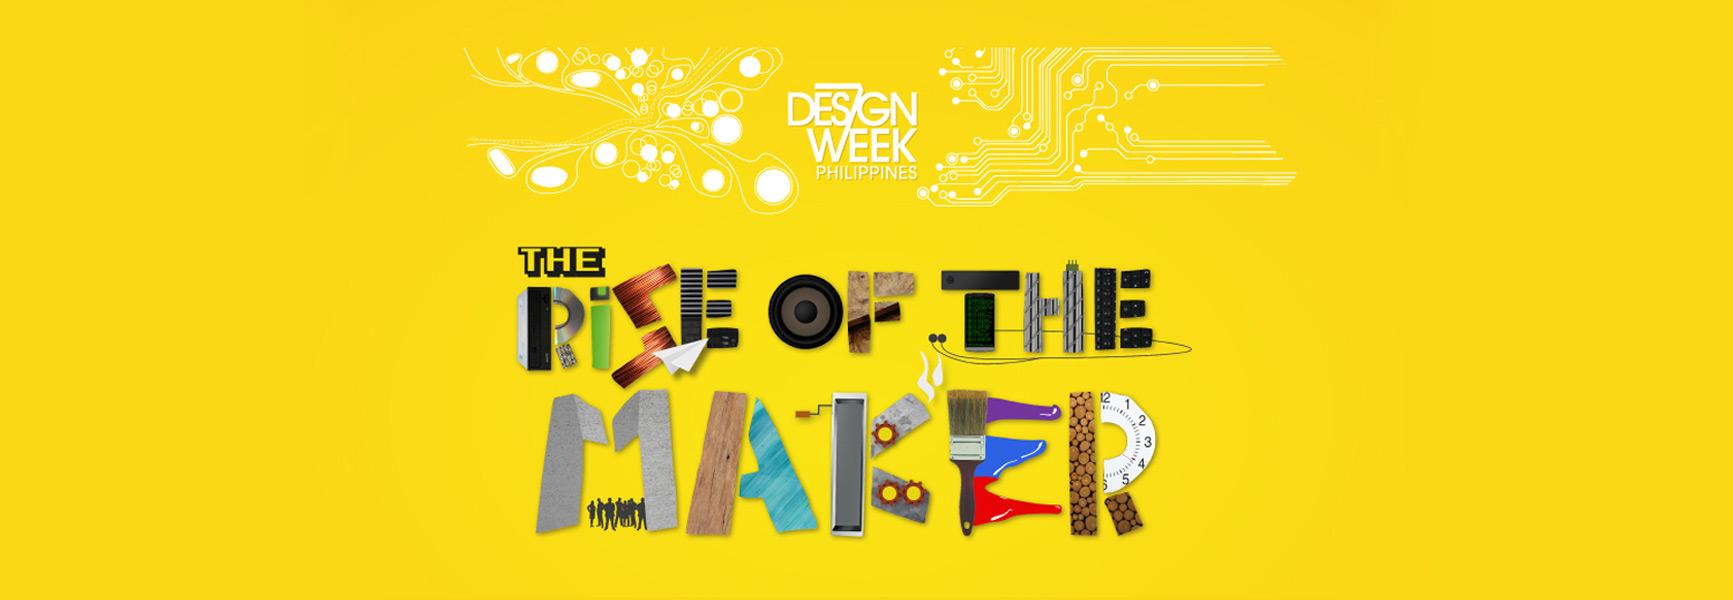 https://www.asean.or.jp/en/wp-content/uploads/sites/3/2015/08/06-rise-of-the-maker.jpg